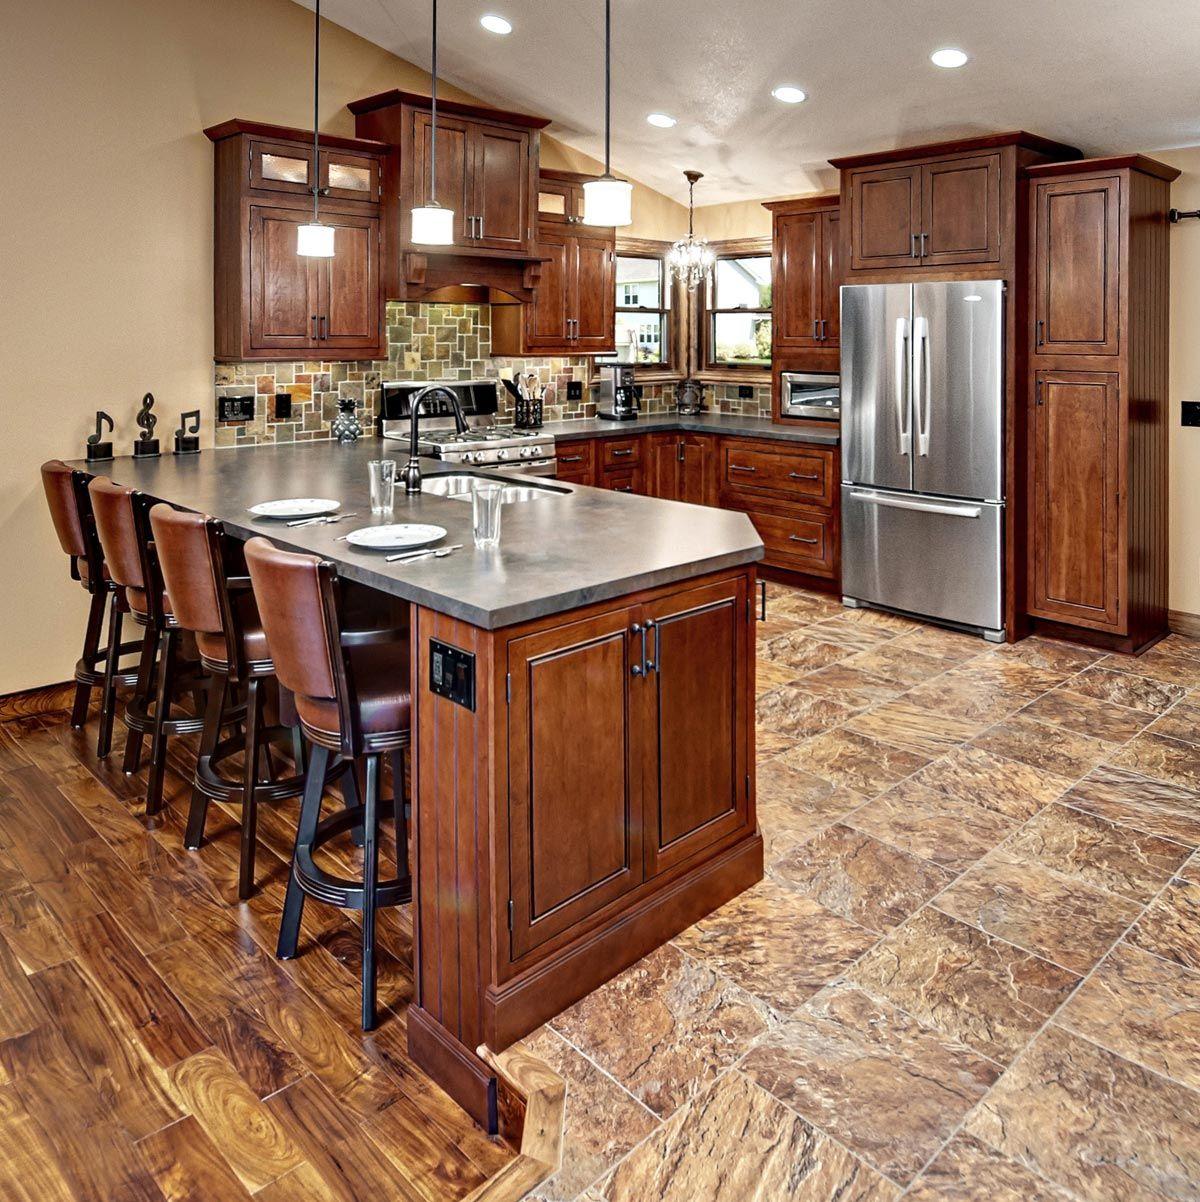 Minnesota Kitchen Cabinets: Minnesota Peninsula Kitchen Has Cherry Cabinets In A